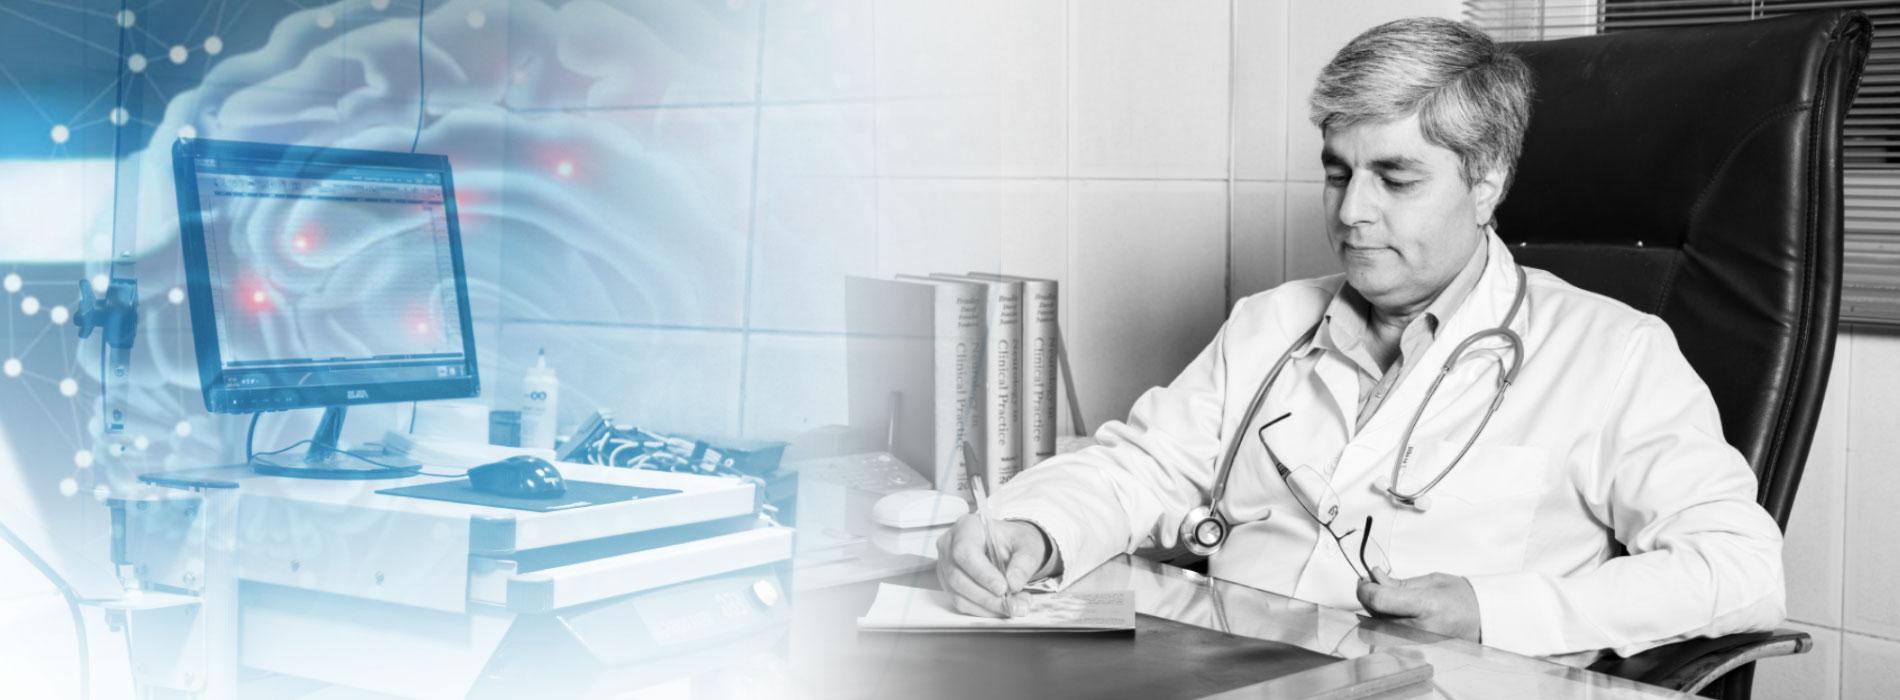 دکتر مهدی رحمانی متخصص مغز و اعصاب